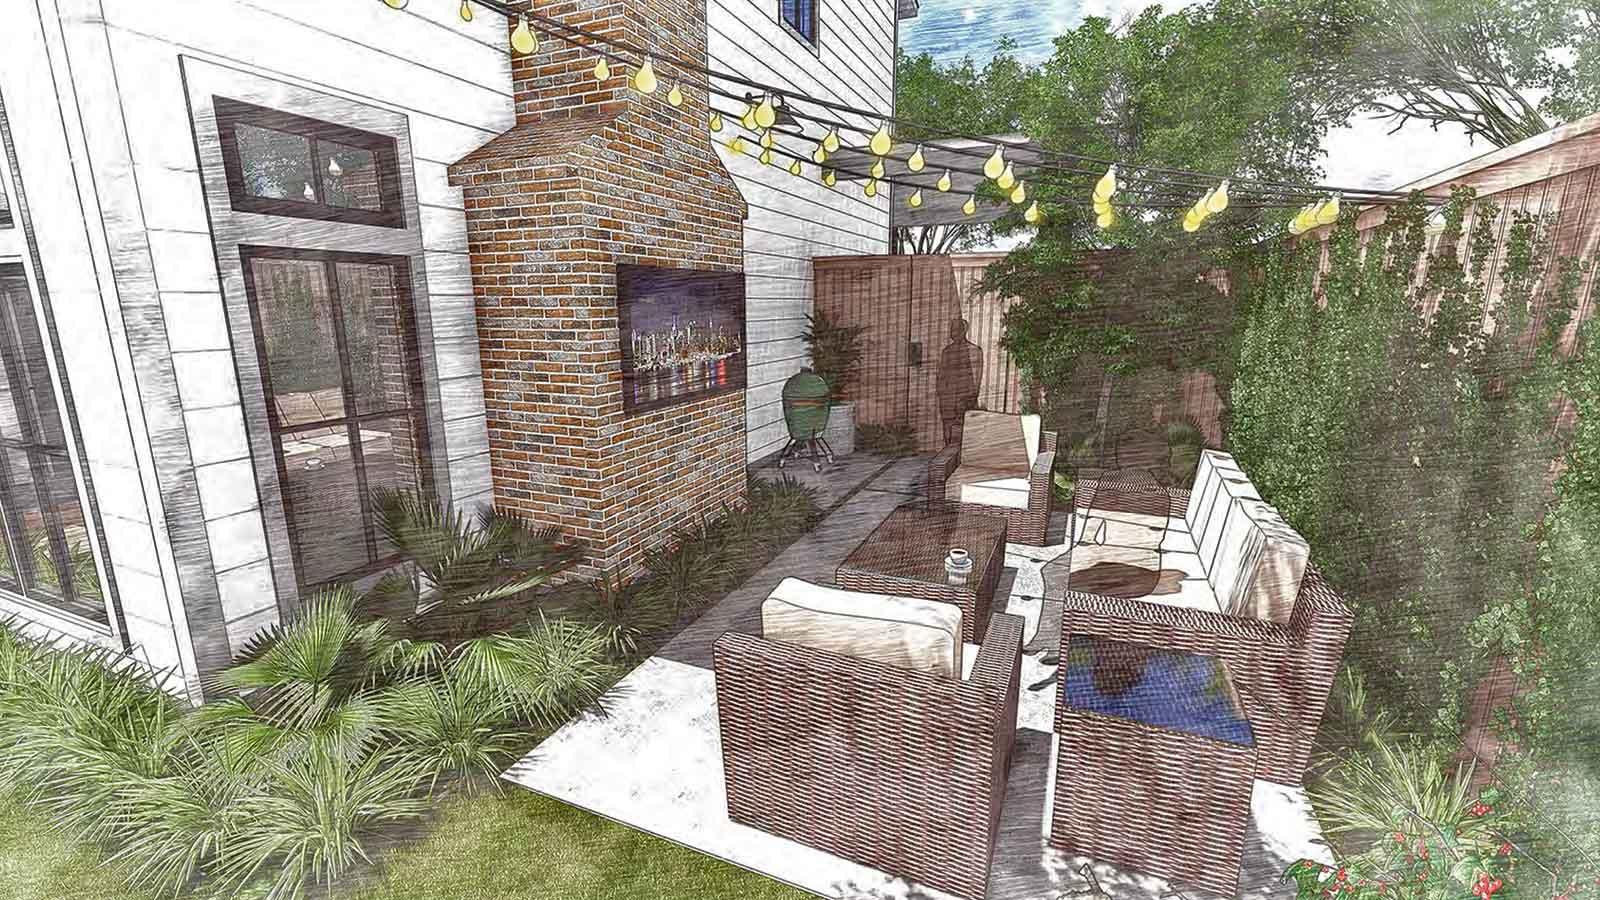 ddla-design_abbott-outdoor-living-area.jpg